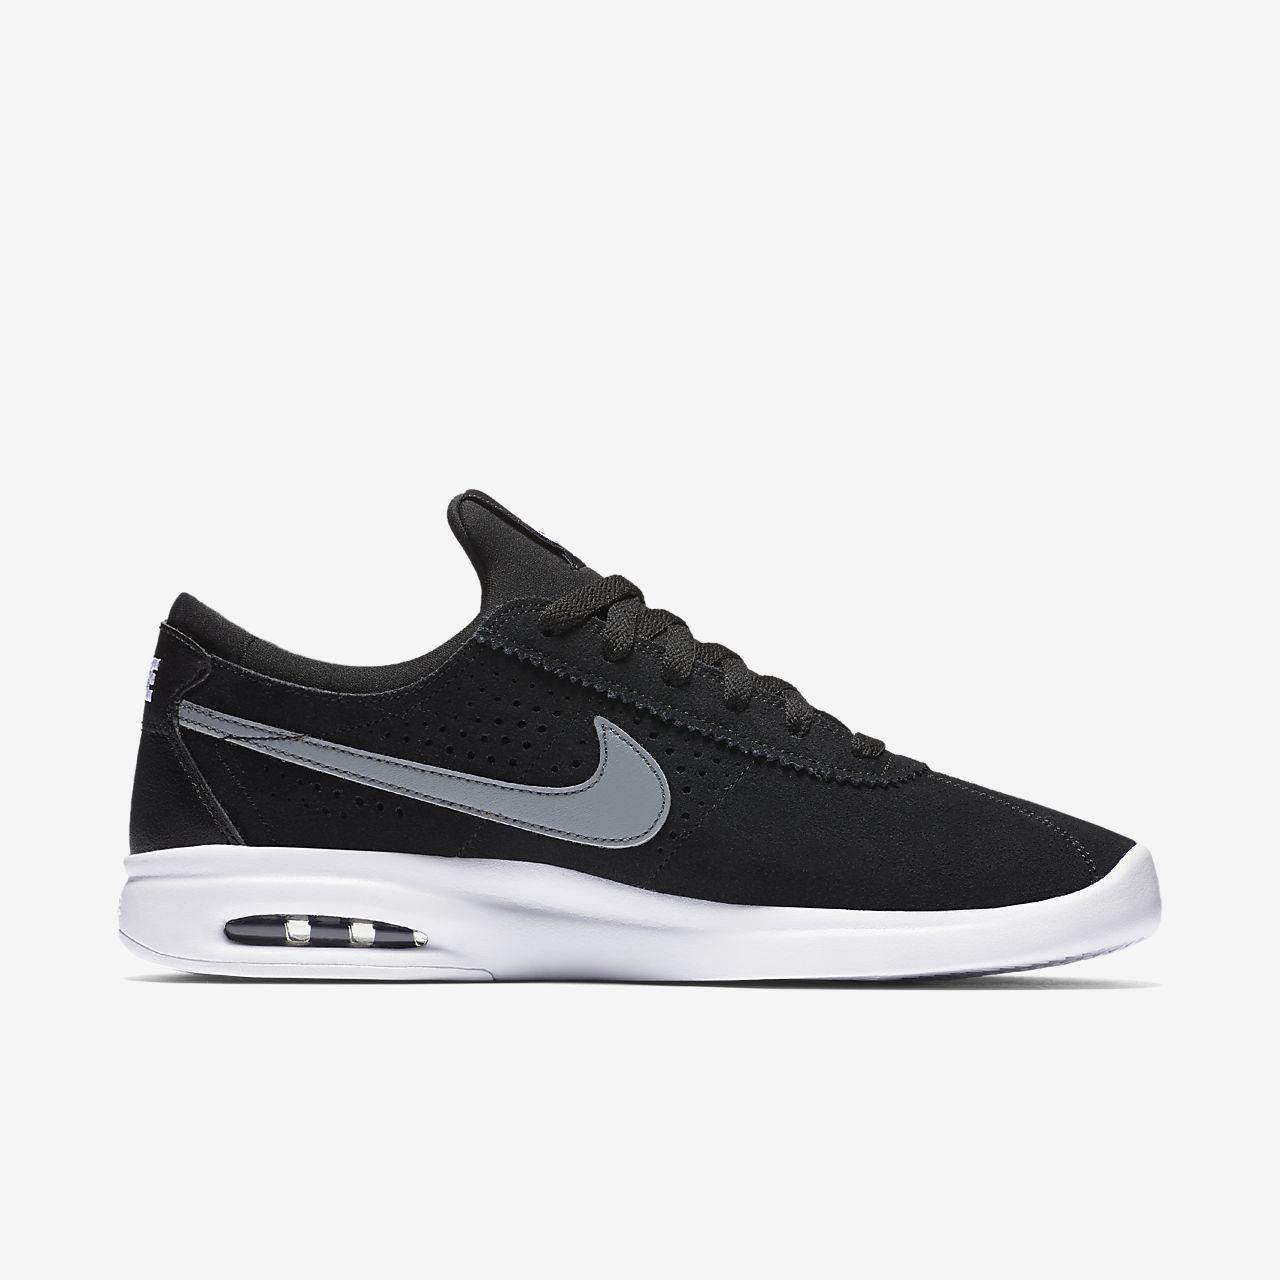 new product 8a72c c83d6 Herren-Skateboardschuh. Nike SB Air Max Bruin Vapor